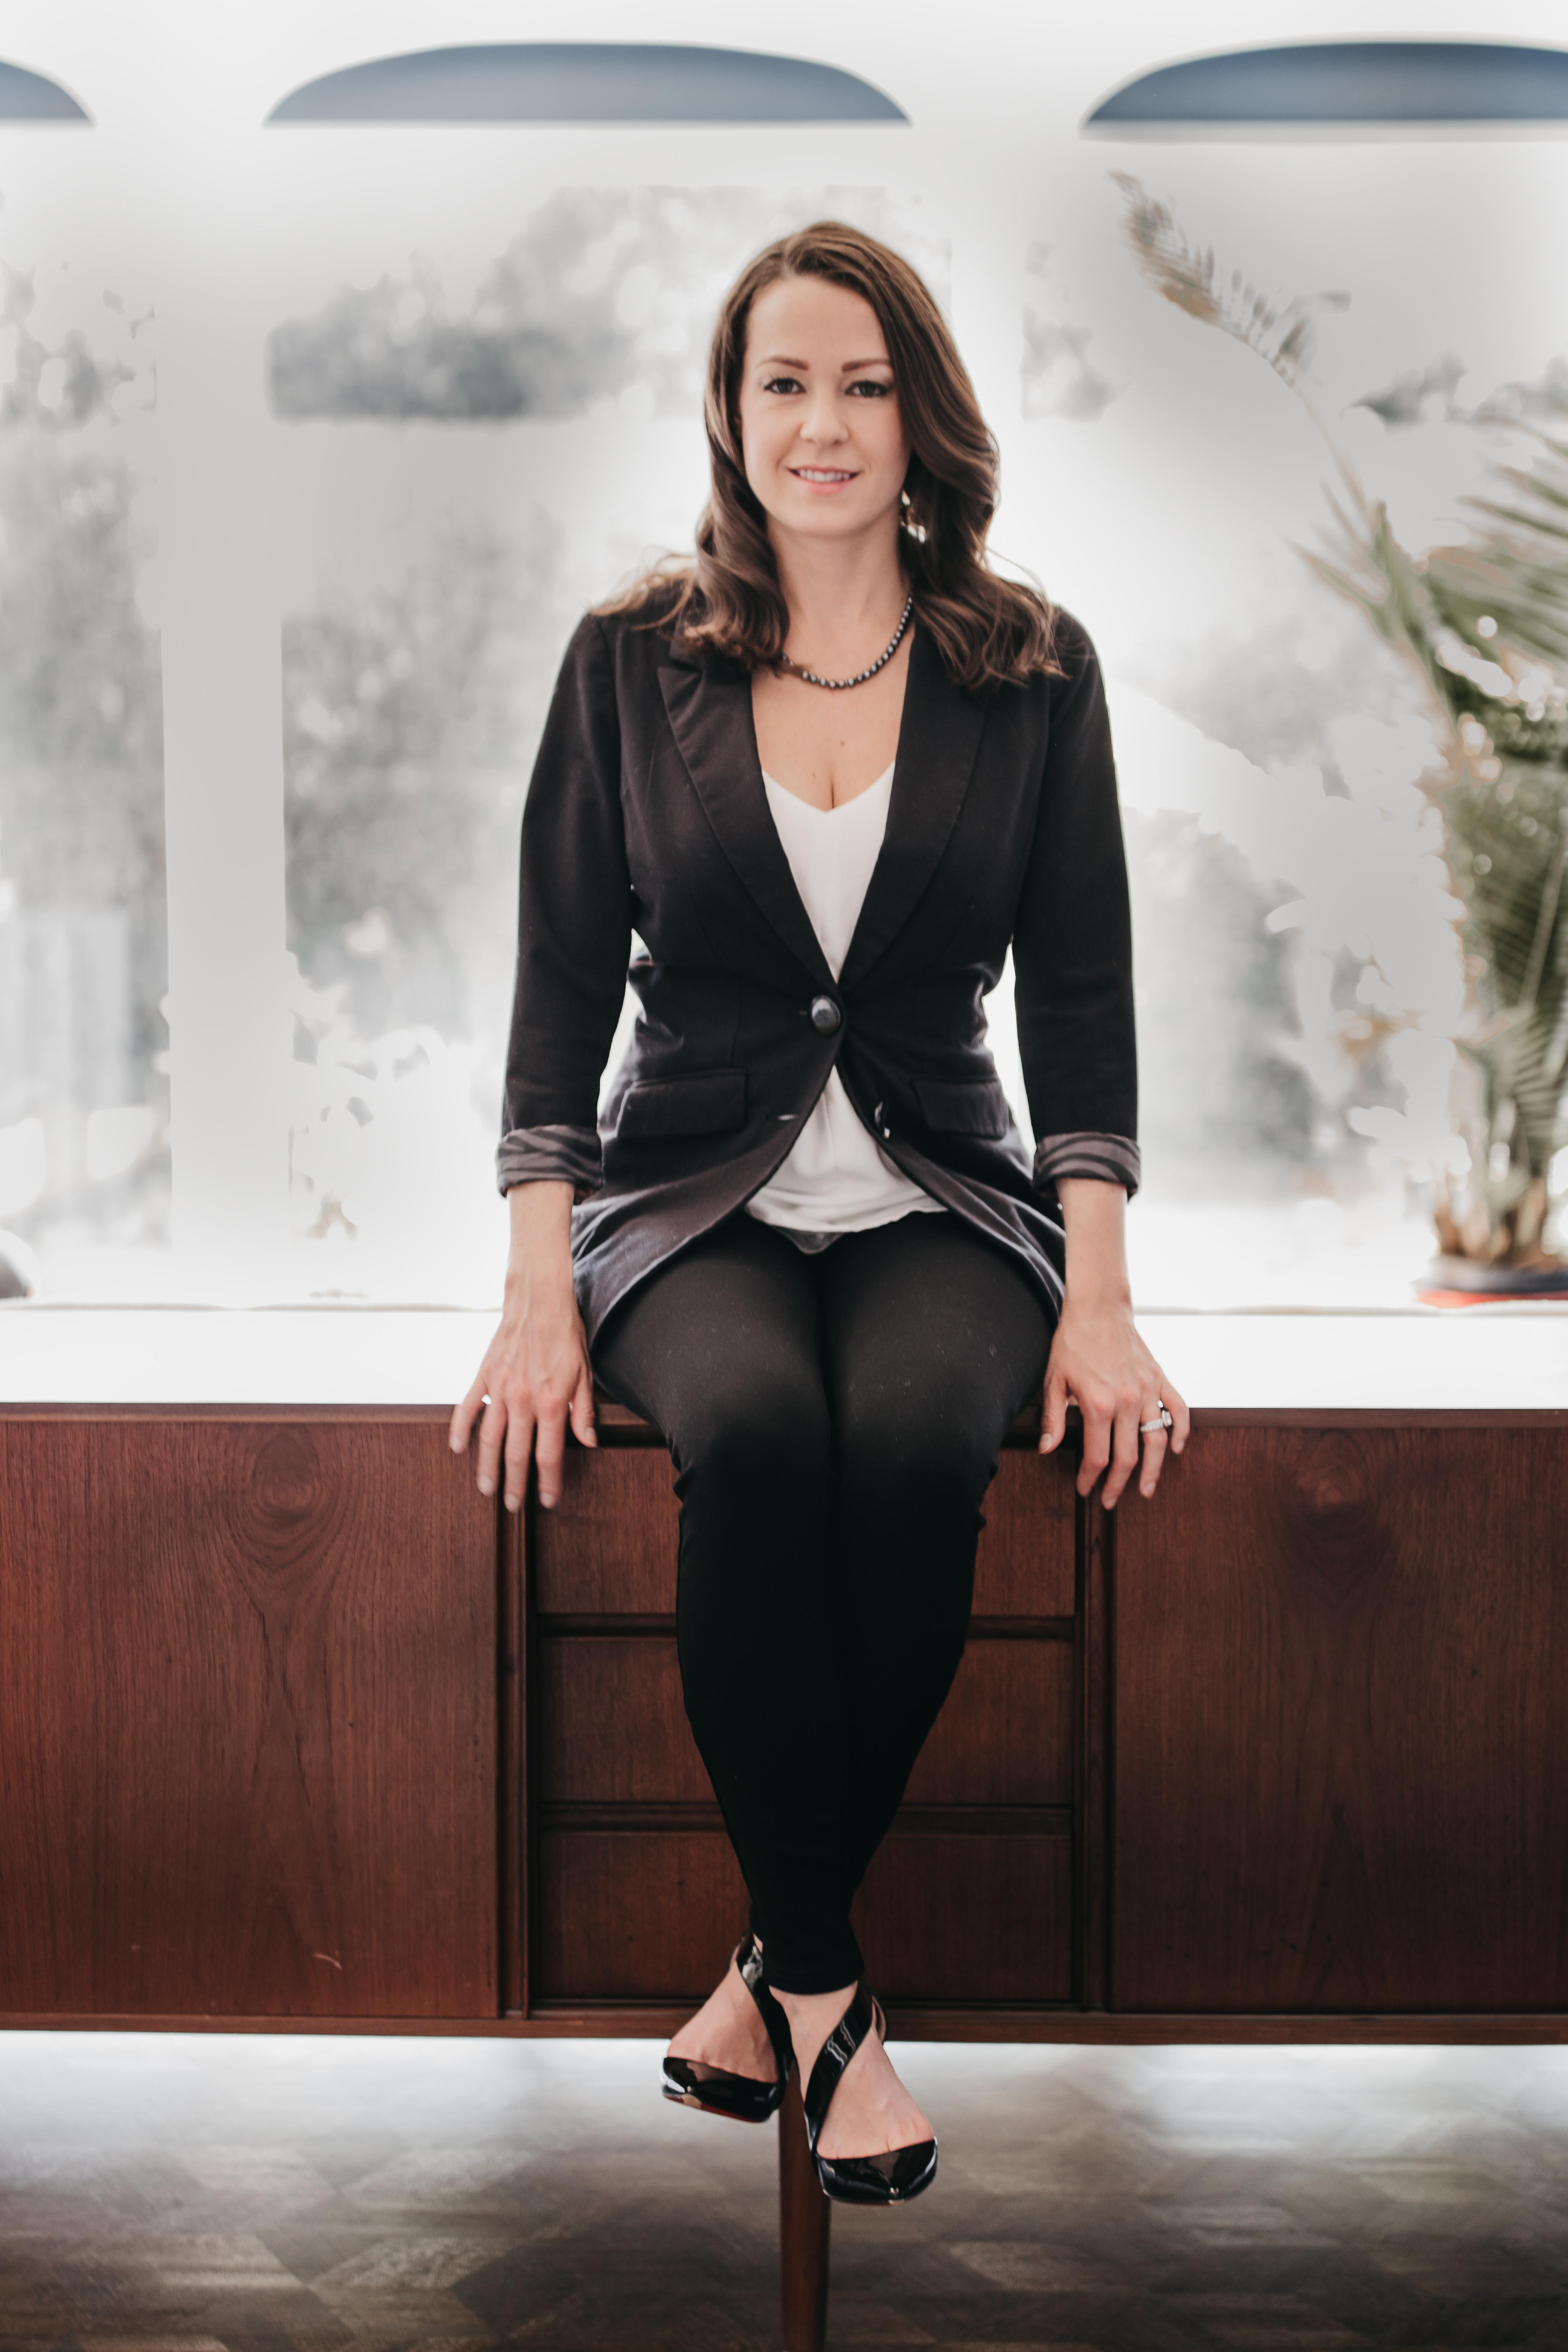 Veronica Santaguida